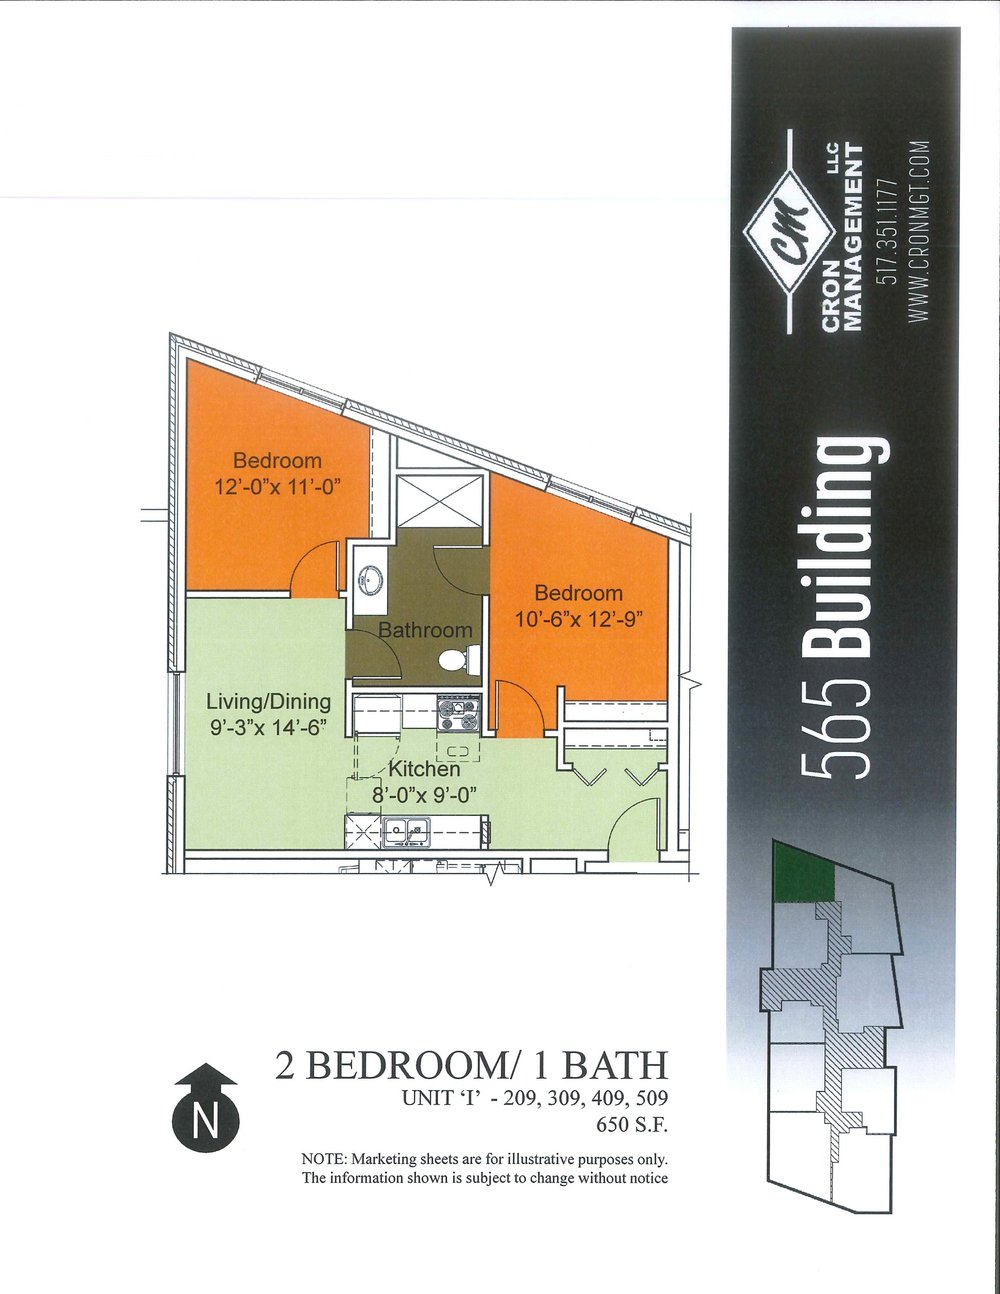 209-509- Two Bedroom, One Bath